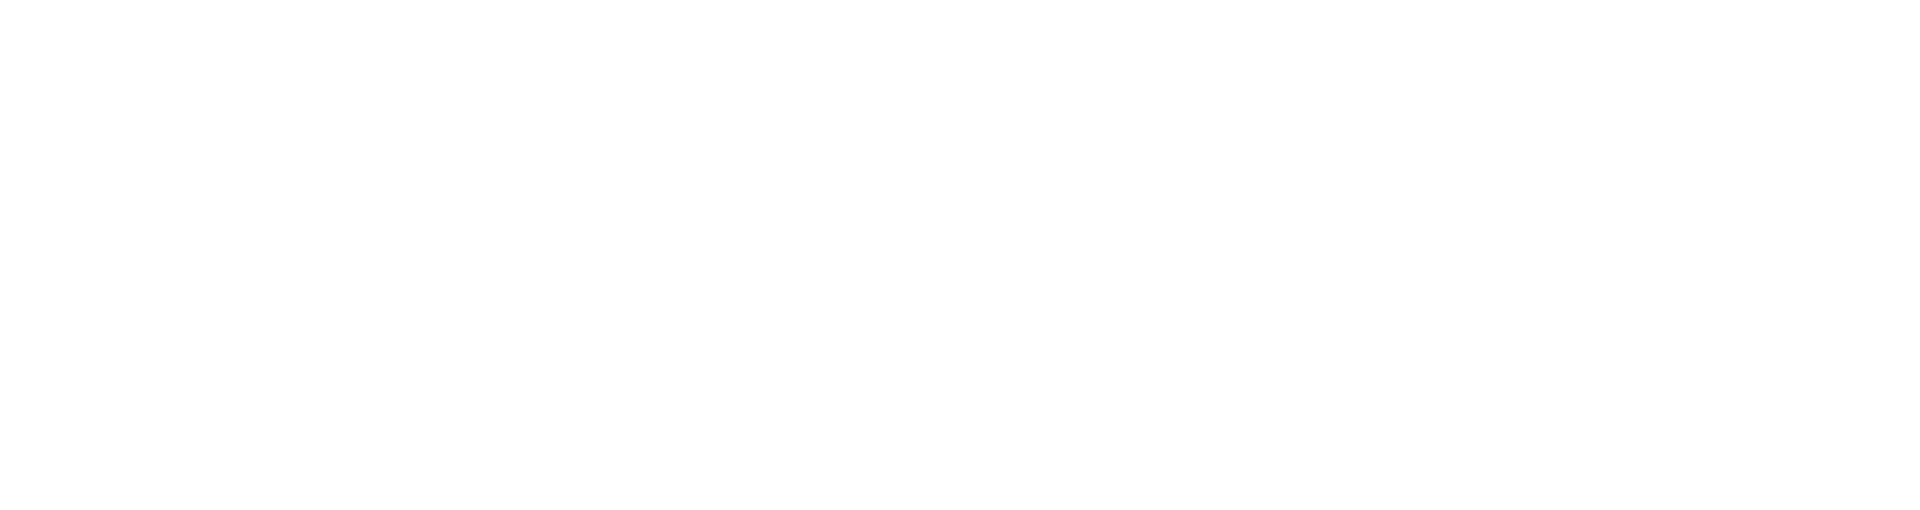 logo alam sutera white